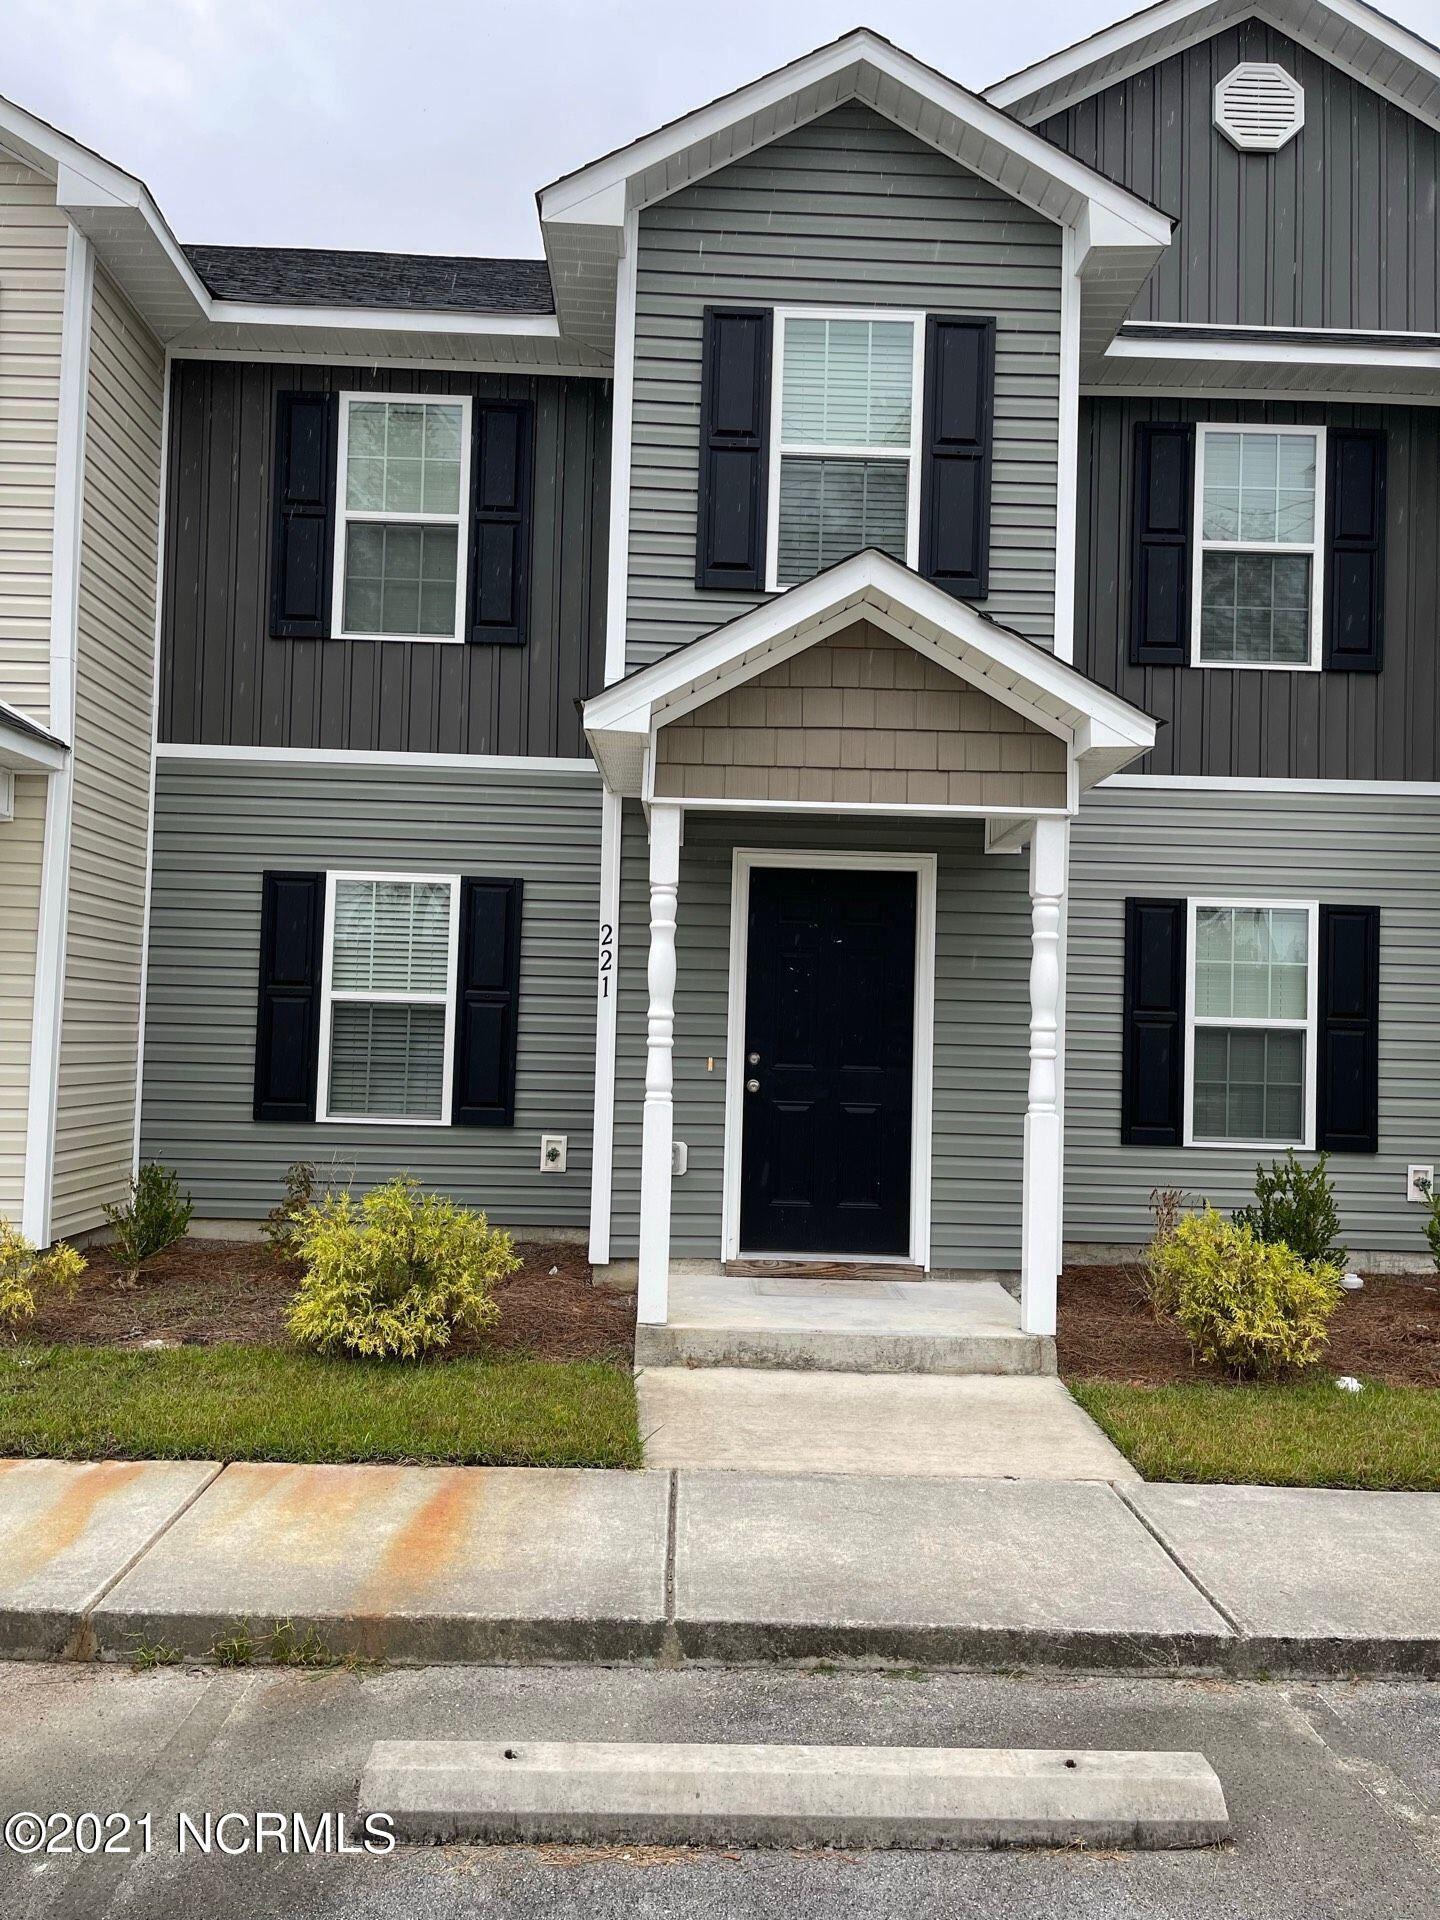 Photo of 221 E Murrow Lane, Jacksonville, NC 28546 (MLS # 100294846)